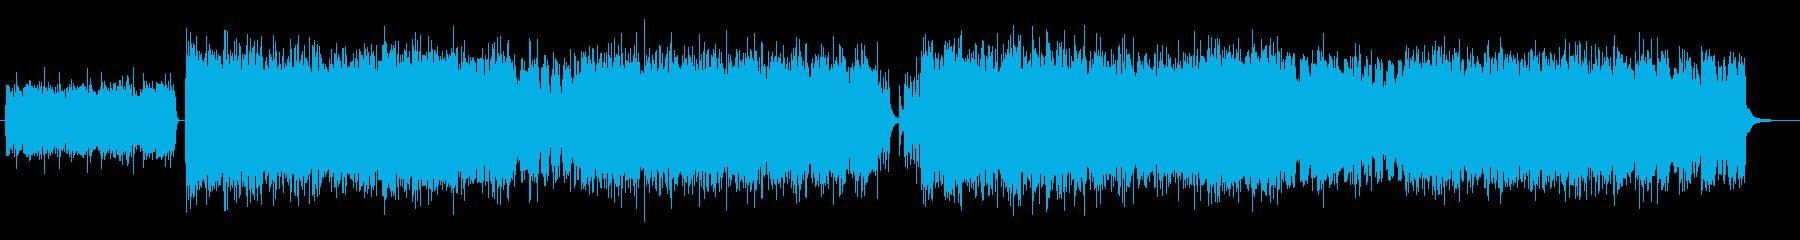 HEAVY・DARK・DEATH 290の再生済みの波形